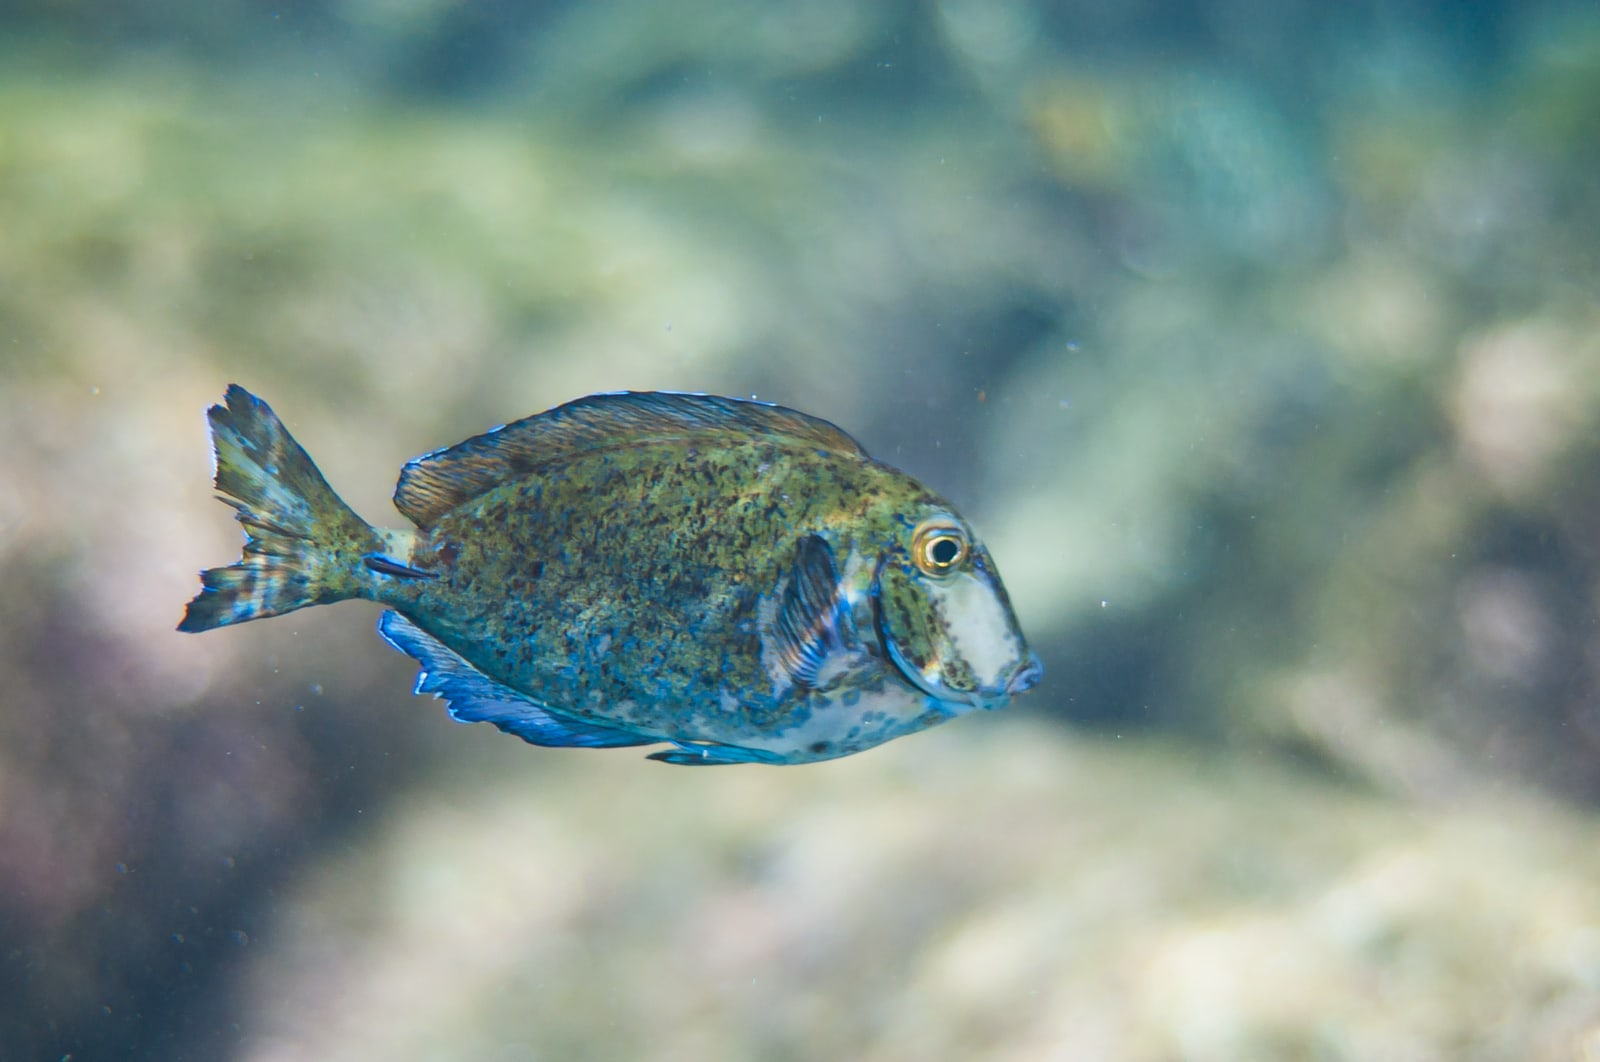 Doctorfish tang (Acanthurus chirurgus) in the Caribbean Sea